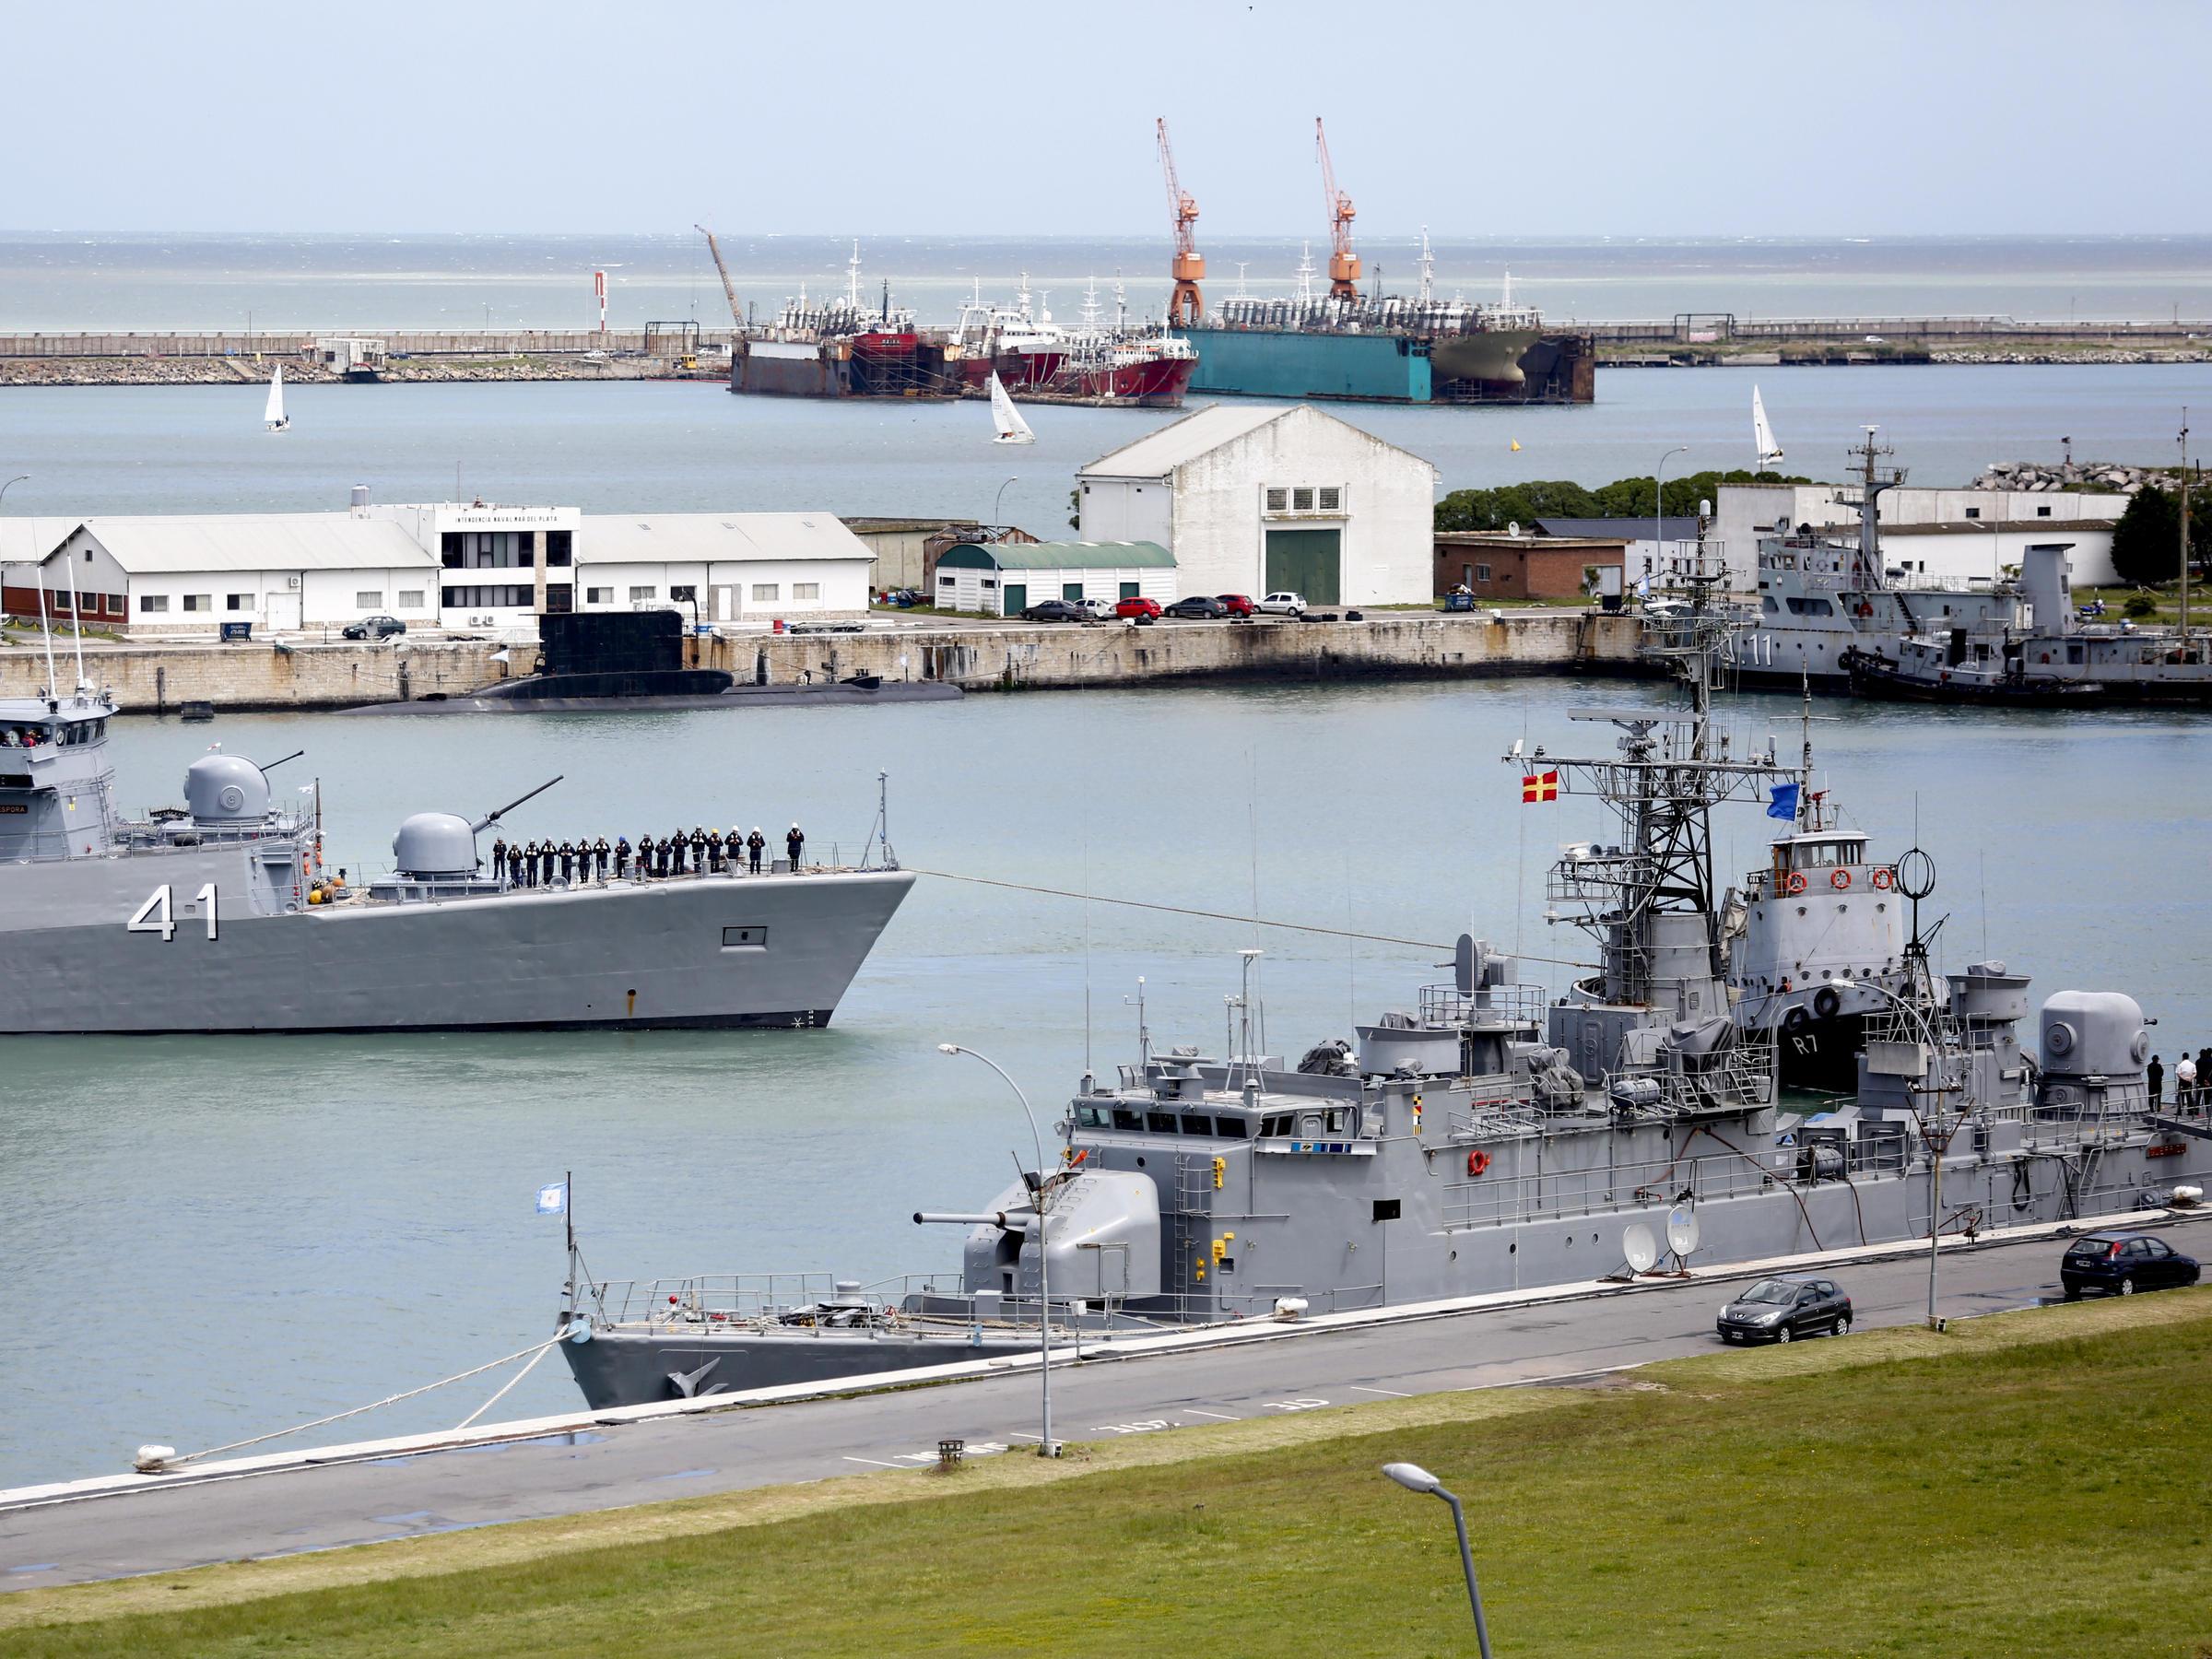 The naval base at Mar del Plata Argentina shown on Saturday